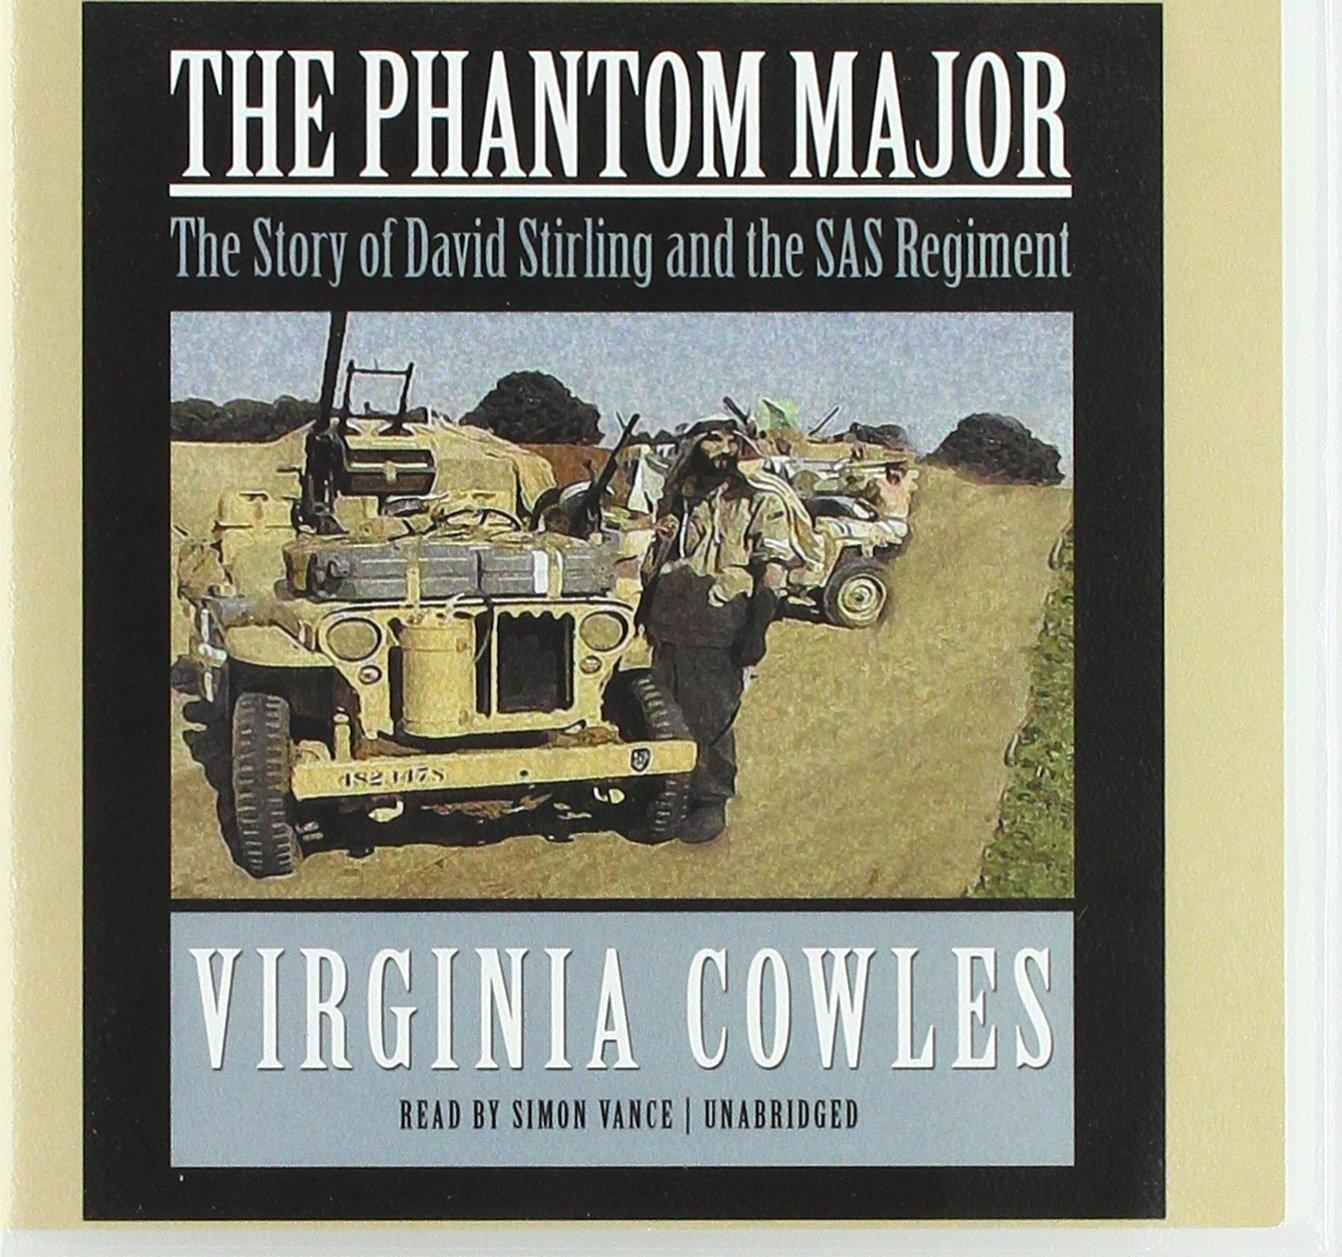 The Phantom Major: The Story of David Stirling and the SAS Regiment PDF